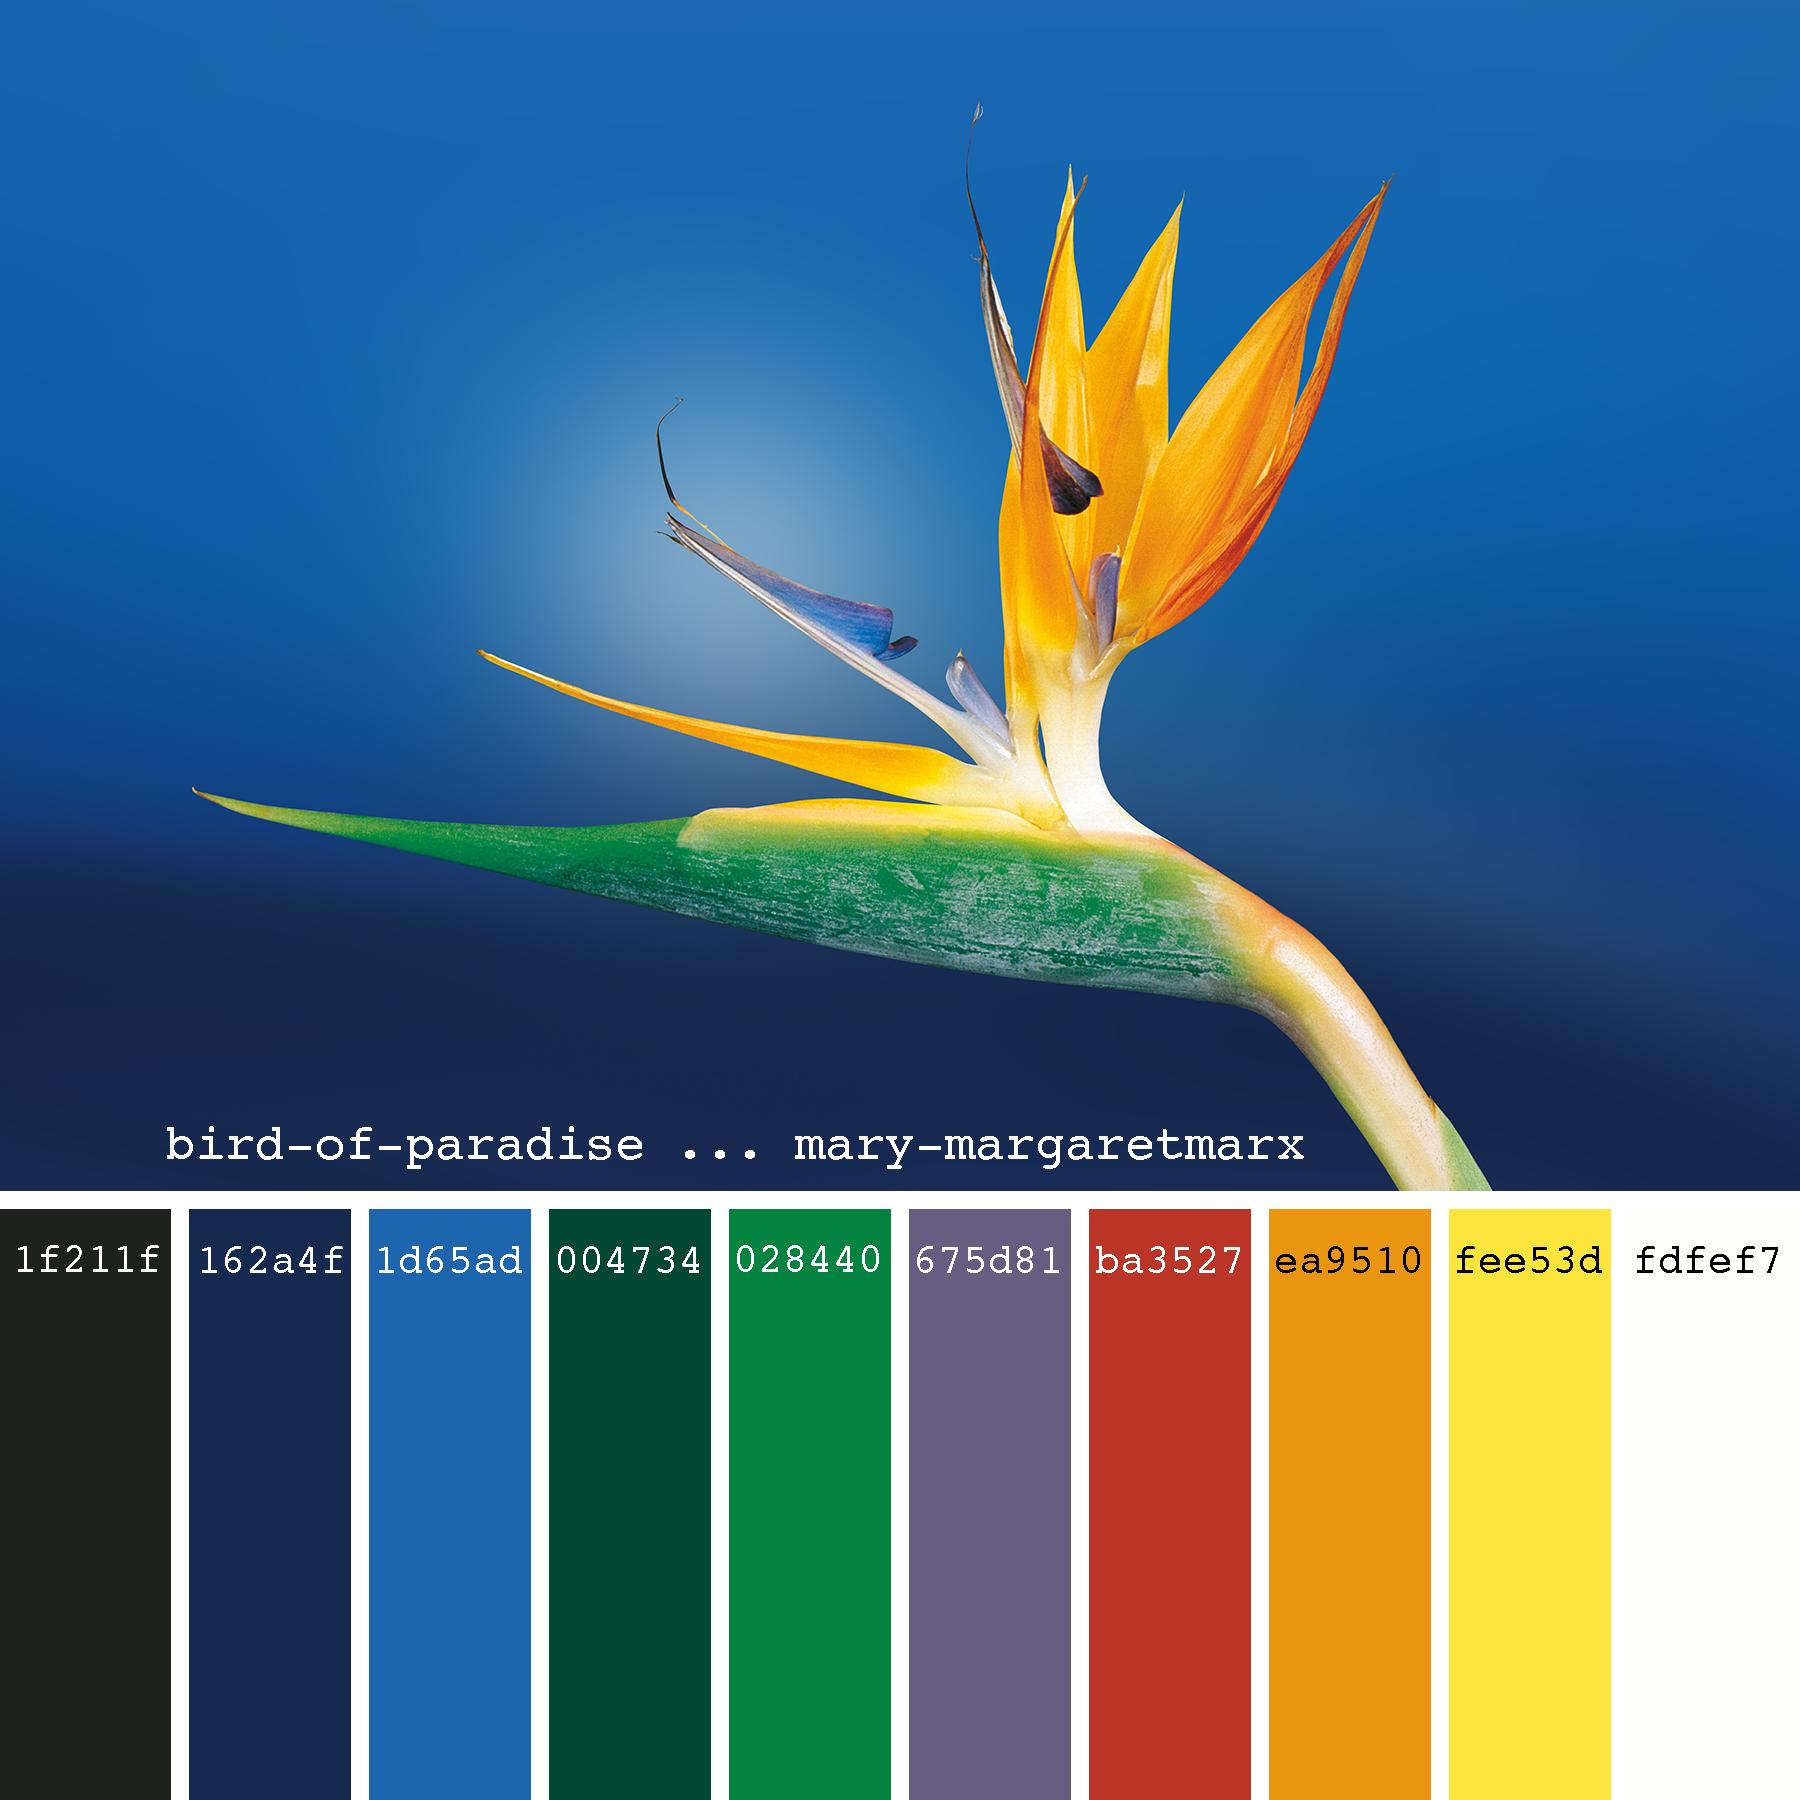 Bird Of Paradise Mary Margaretmarx Color Colors Colour Colours Colorpalette Colorpalettes Colo Ocean Color Palette Color Palette Design Ocean Colors